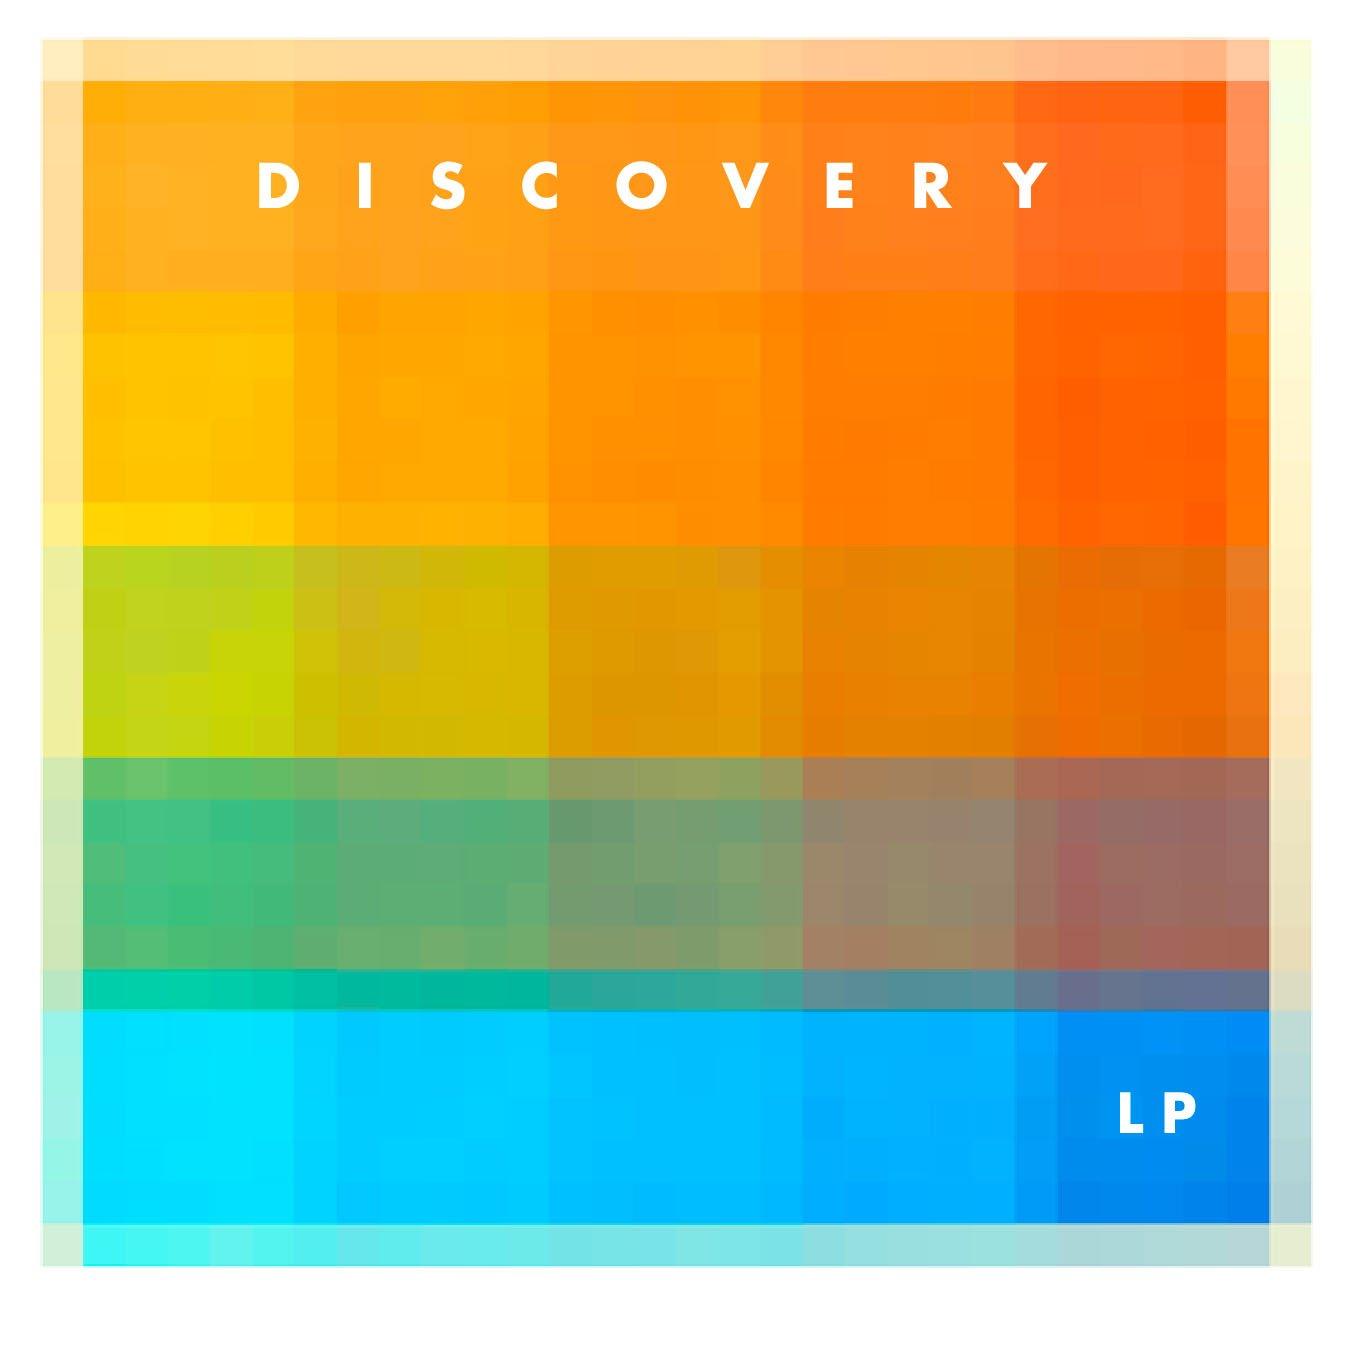 LP [Vinyl]